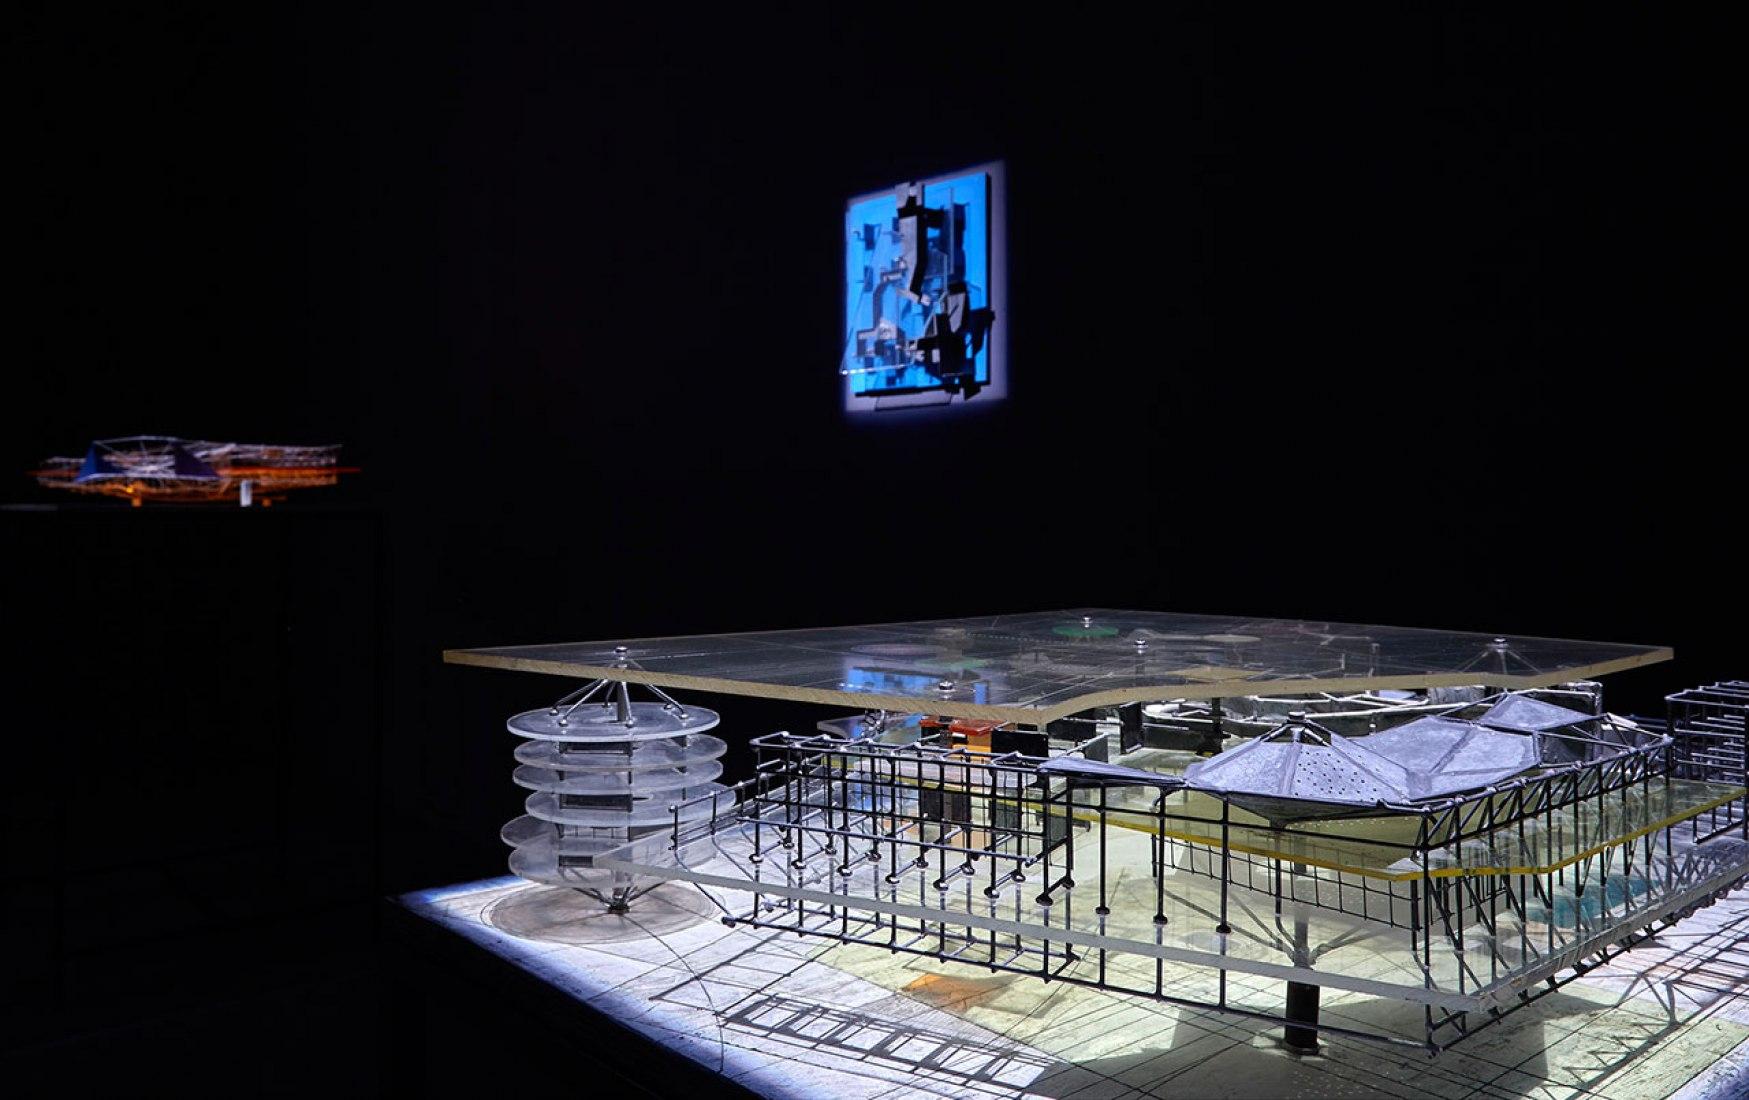 Constant. Nueva Babilonia. Vista de Sala. Museo Nacional Centro de Arte Reina Sofia, 2015. Fotografía @ Joaquín Cortés/Román Lores. Imagen cortesía de MNCARS.